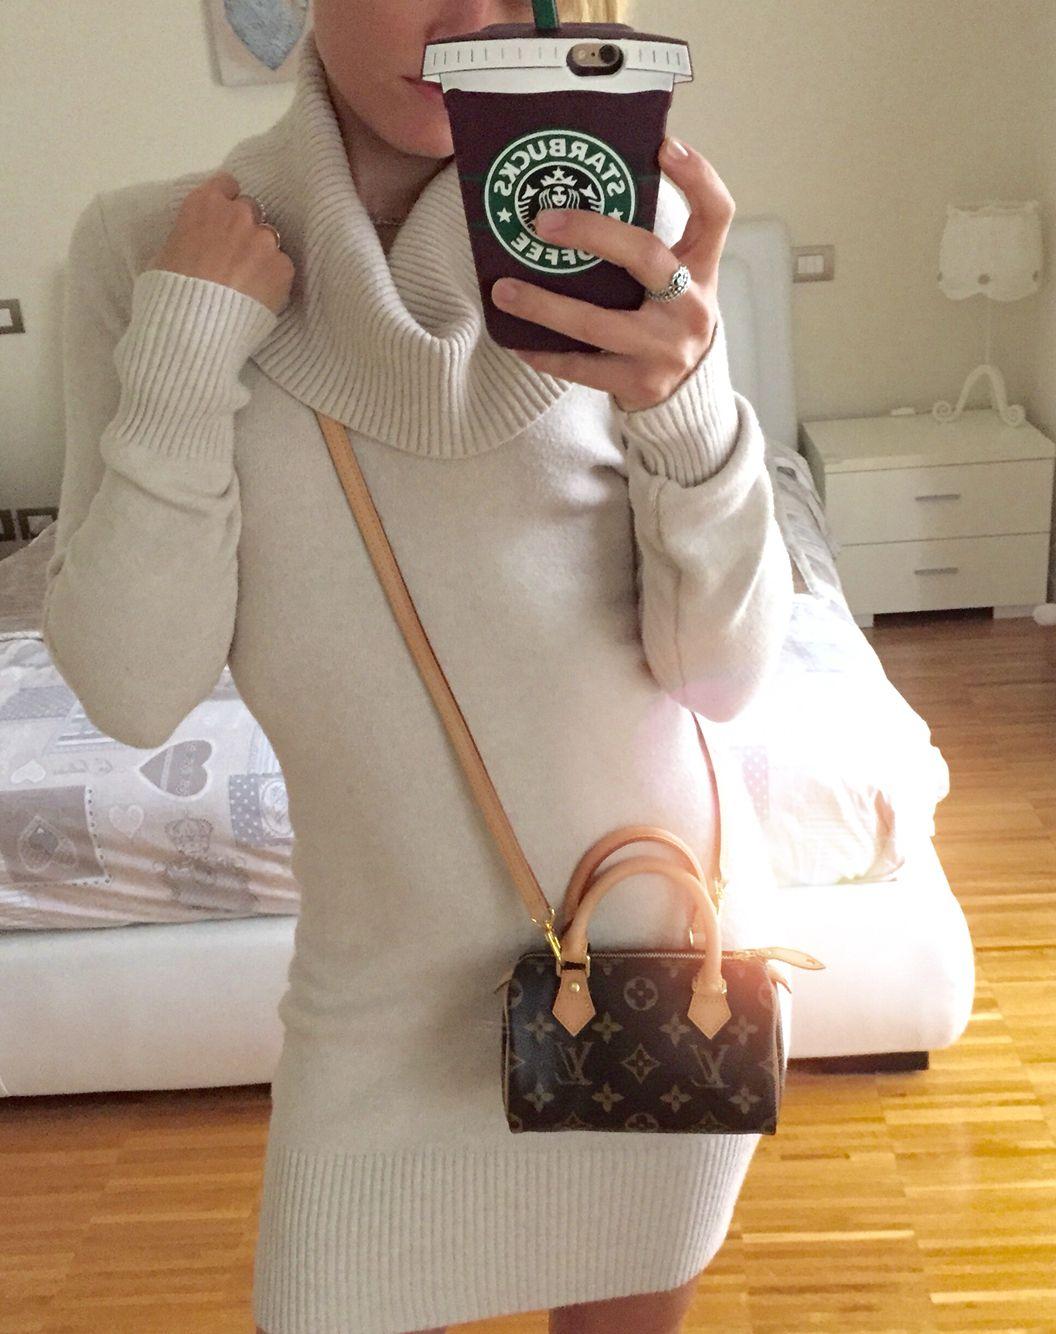 c8fe781b34 Minibag louis vuitton mini hl speedy nano borsa bauletto piccola tascabile  miniature miniatura